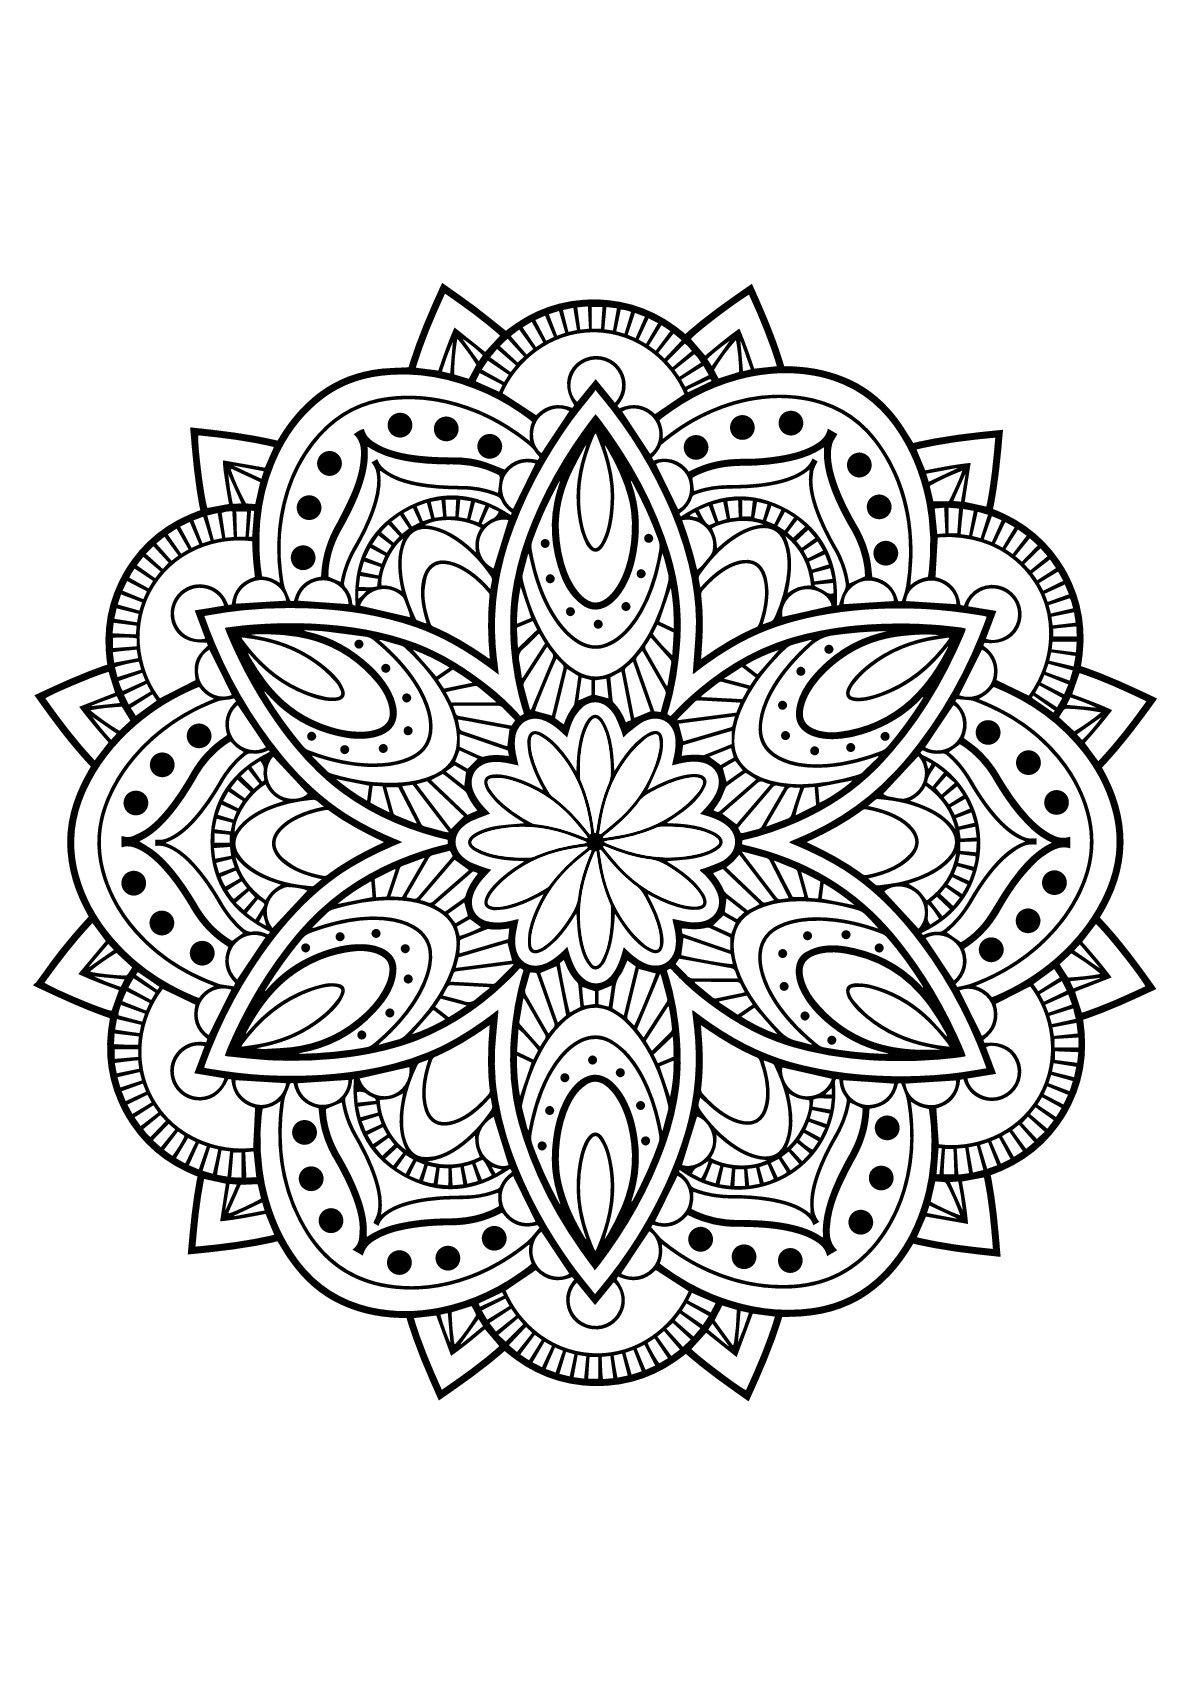 Livre De Coloriage Mandala Awesome Mandala Livre Gratuit 16 intérieur Coloriage De Mandala Difficile A Imprimer